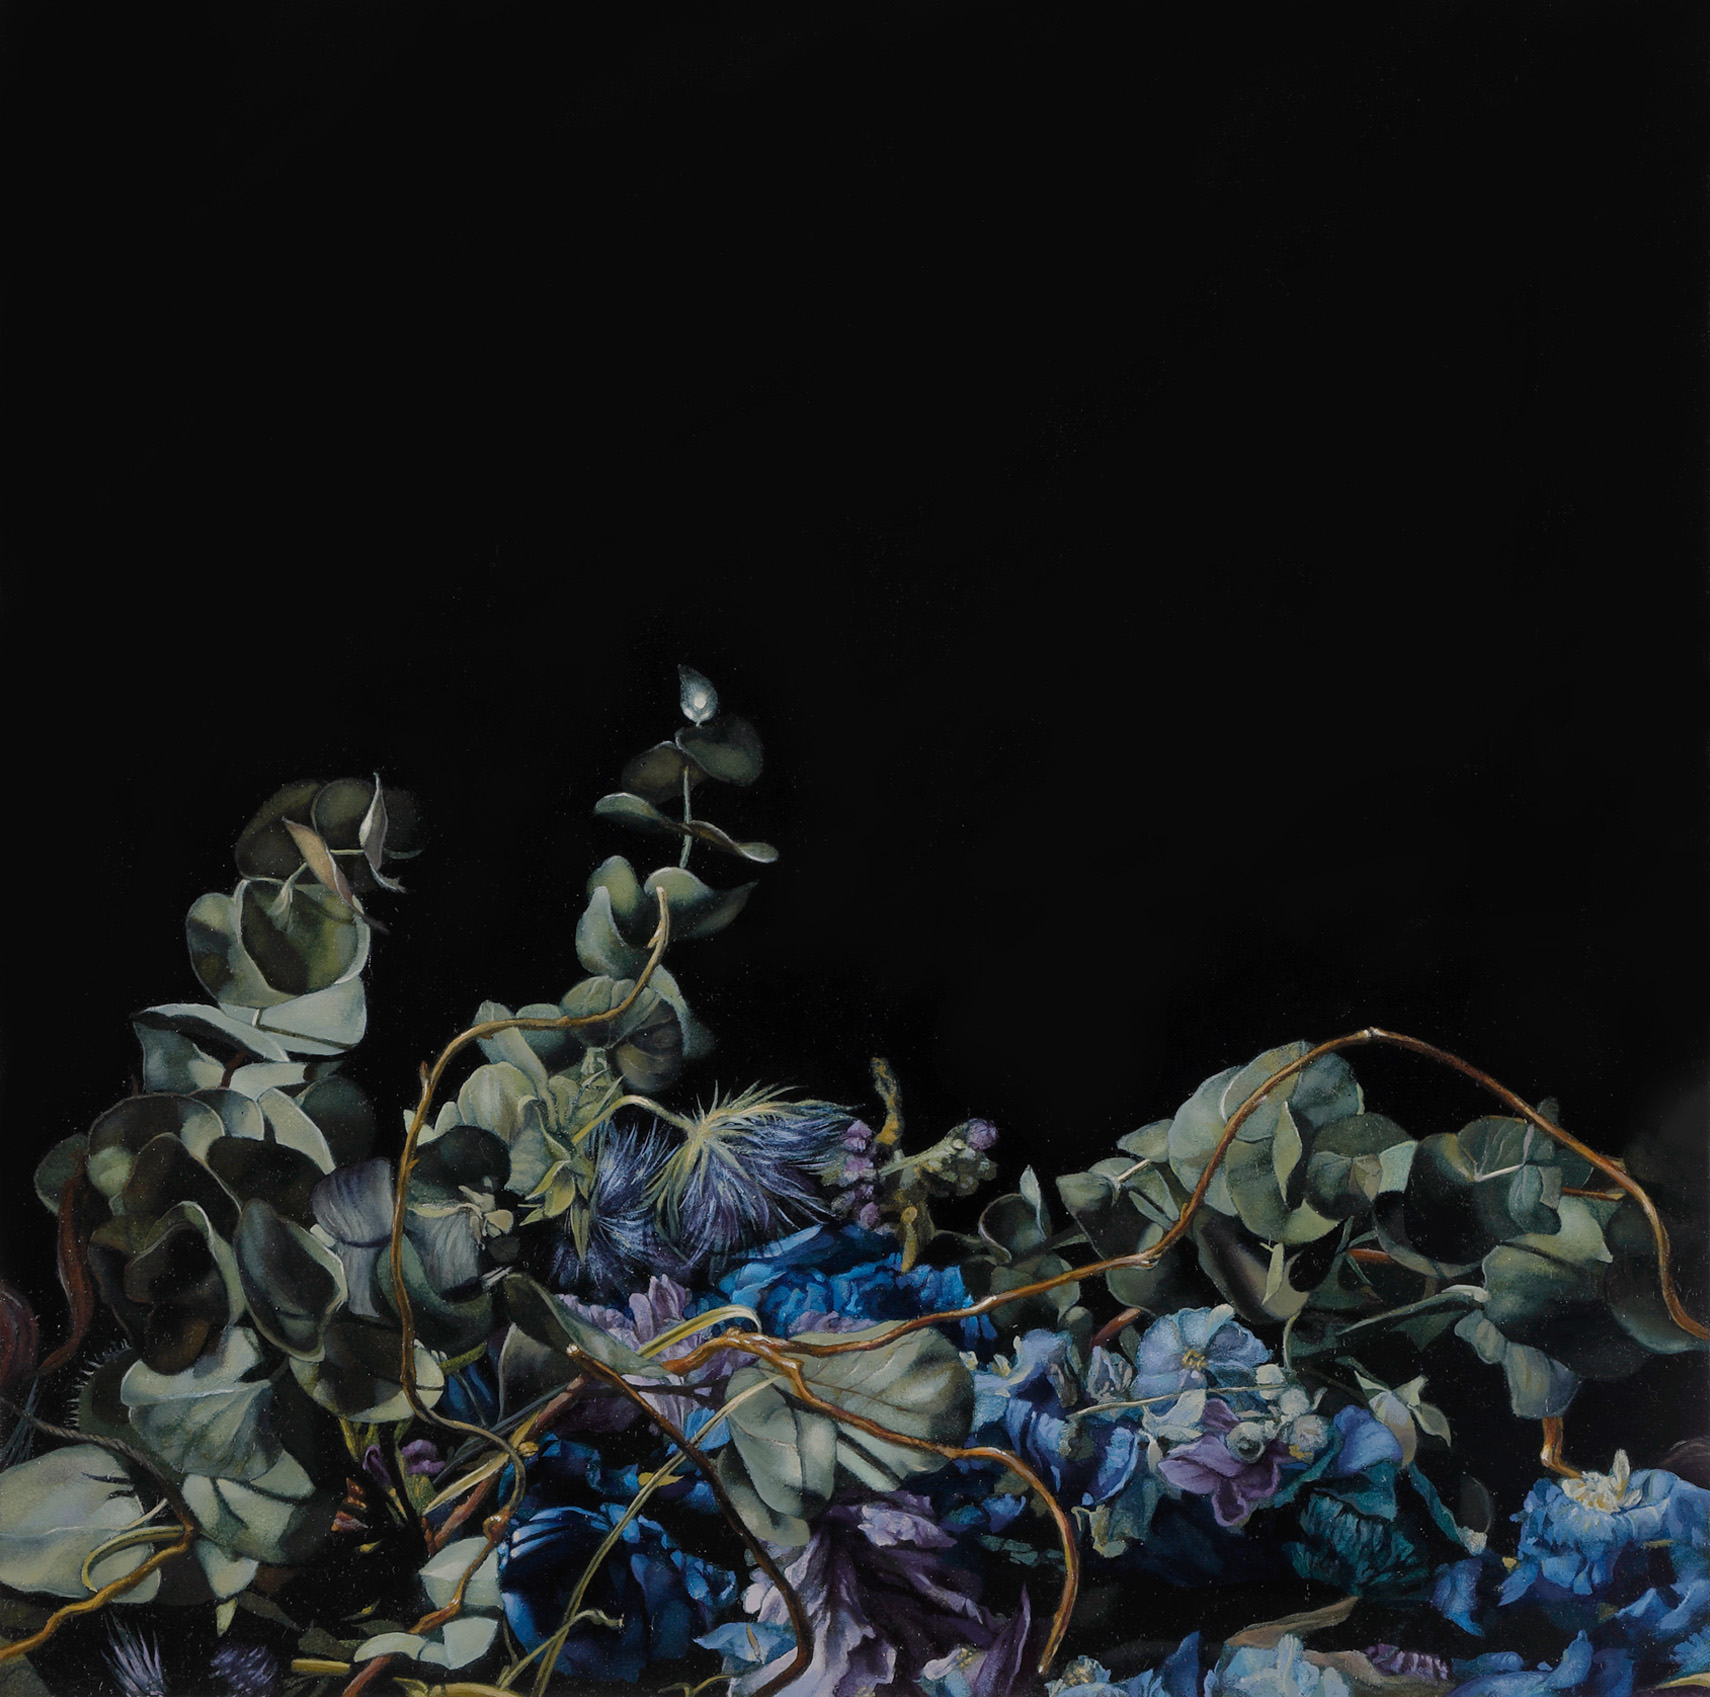 Arisa Kumagai, Parallel line, 2020, oil on panel, 33.5 x 33.5 cm